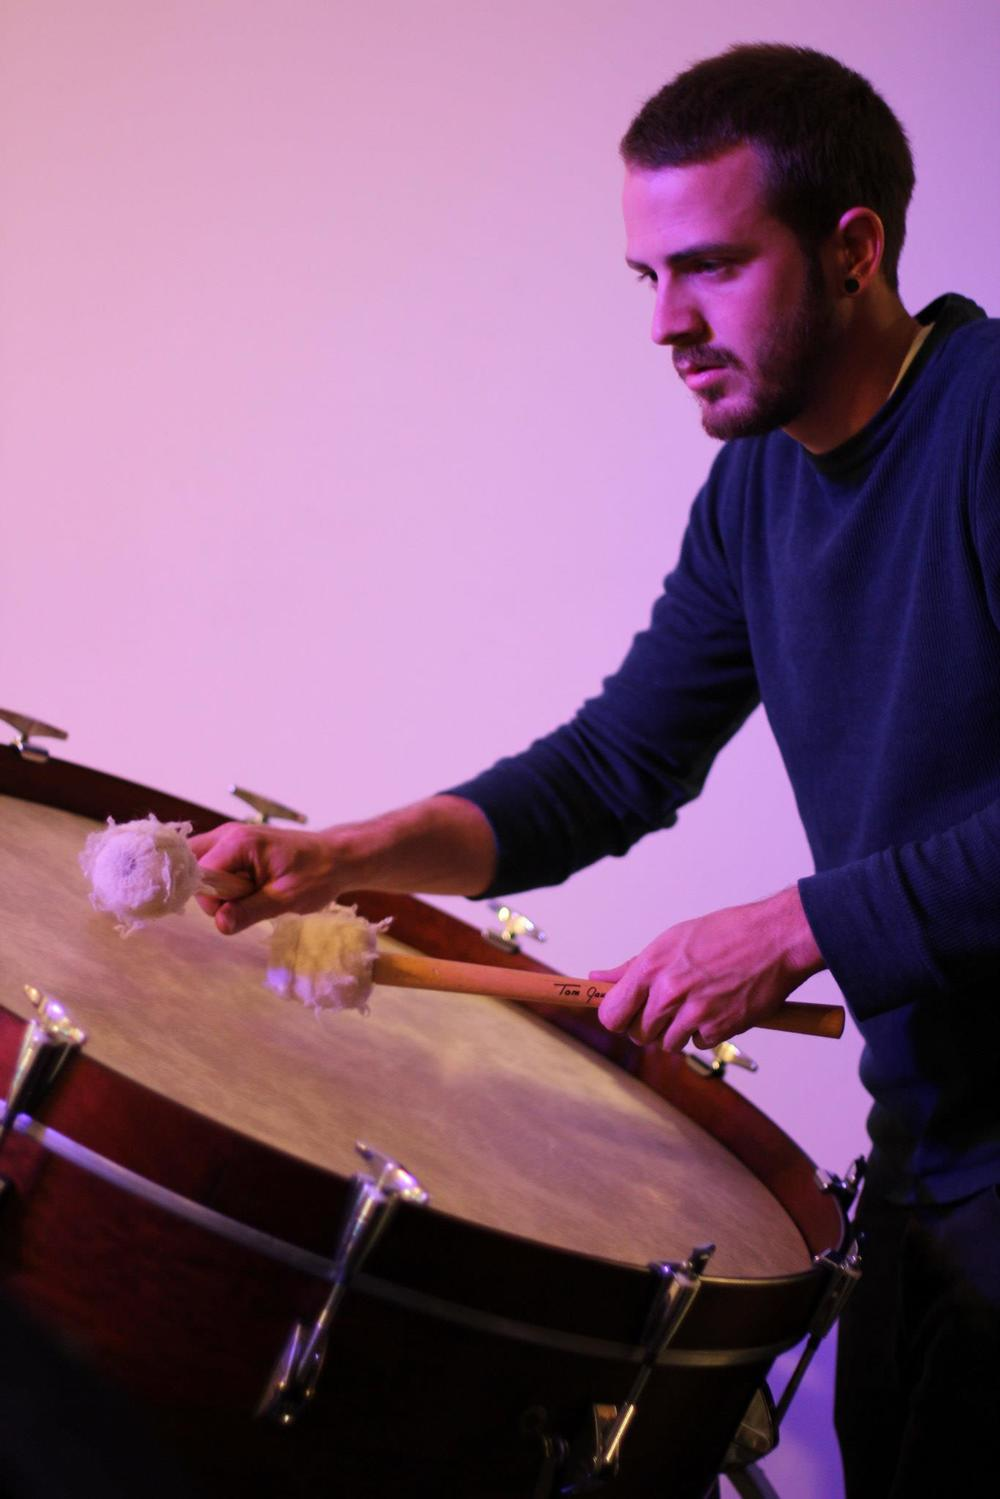 percussionist Nick Matthiesen